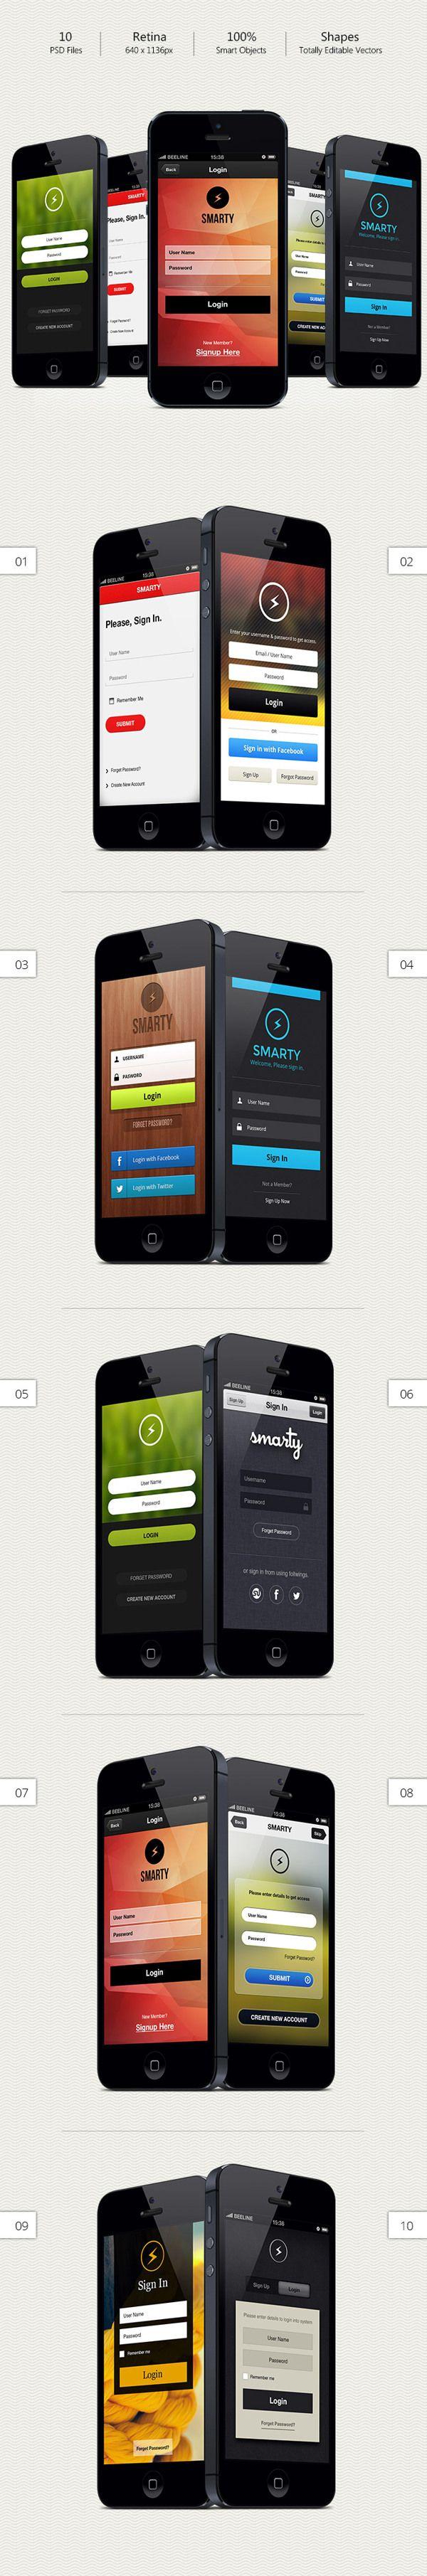 Ultimate Mobile Login Designs by Bouncy Studio, via Behance